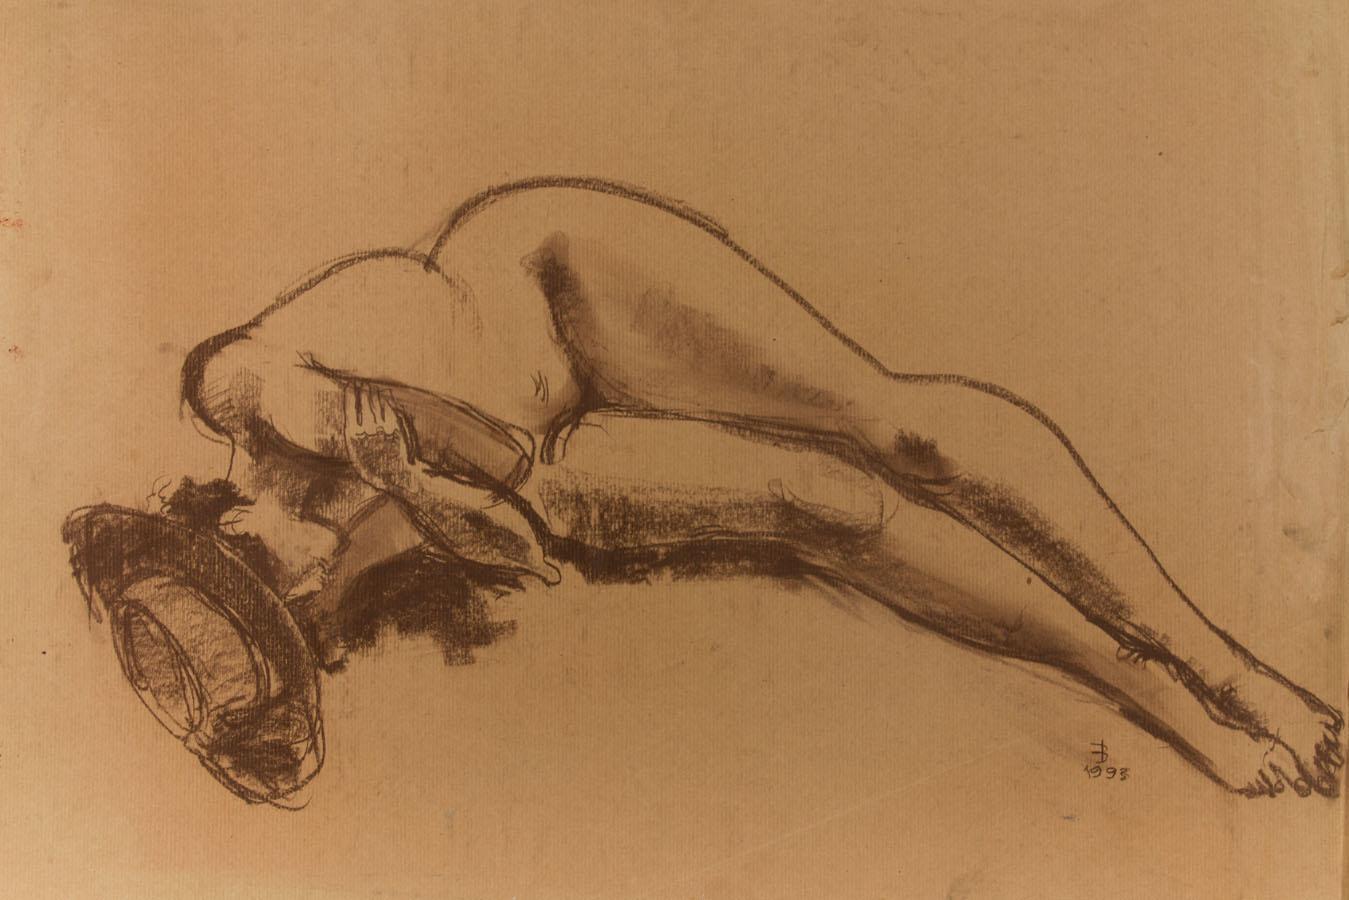 Modern British School - 1993 Crayon, Female Nude with Sun Hat Modern British School